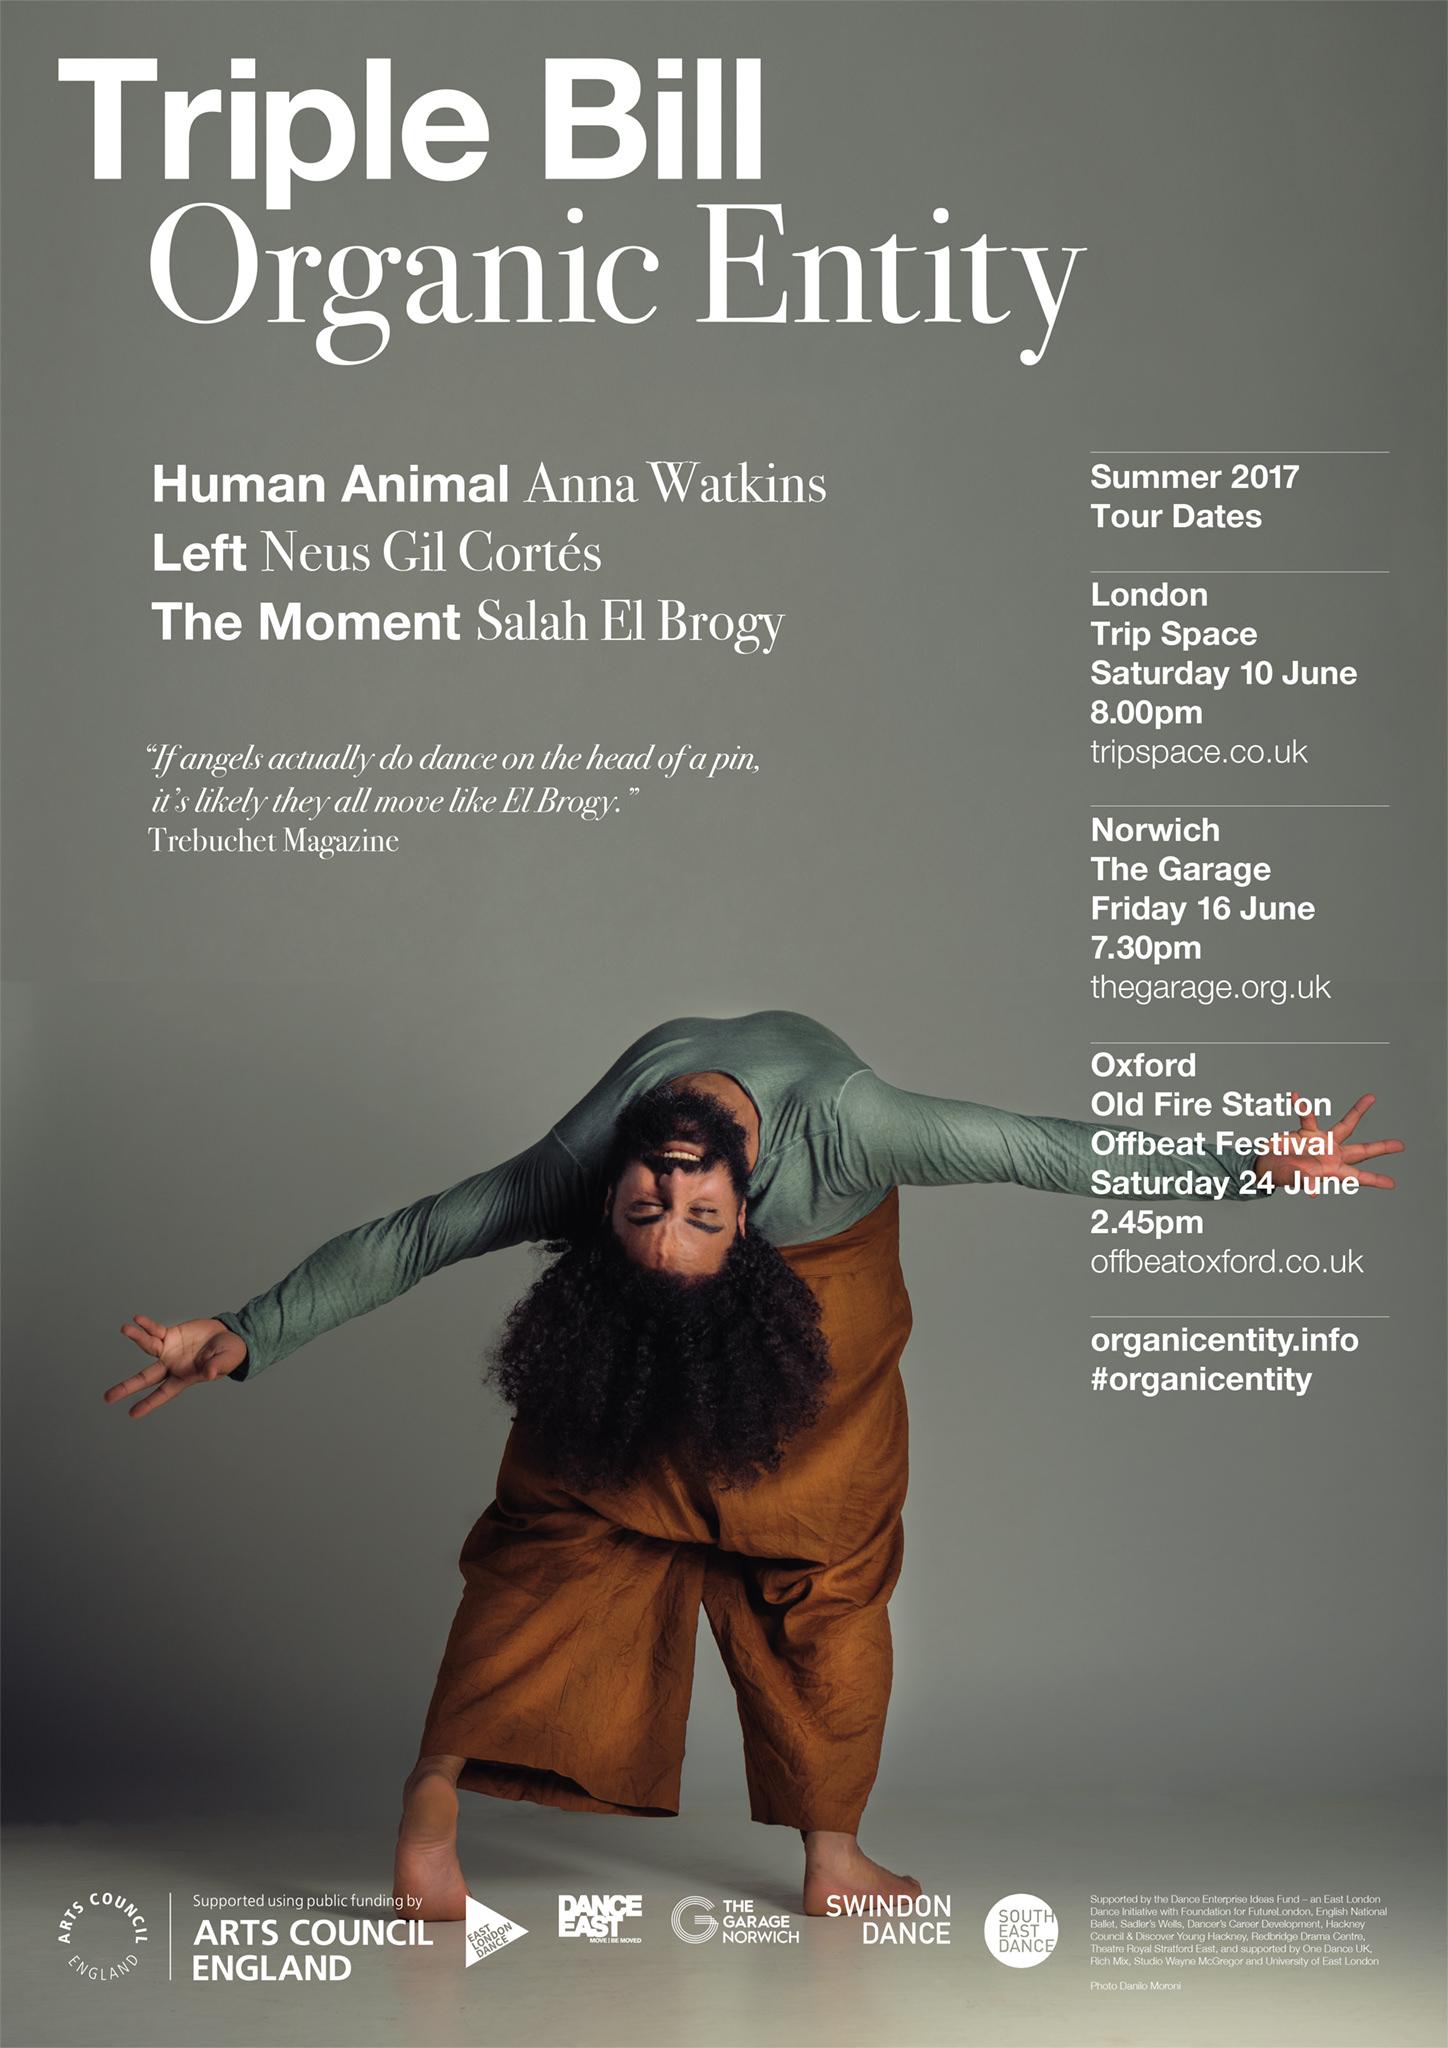 Triple_Bill_Poster1_Organic_Entity_photo_Danilo_Moroni.jpg.jpg